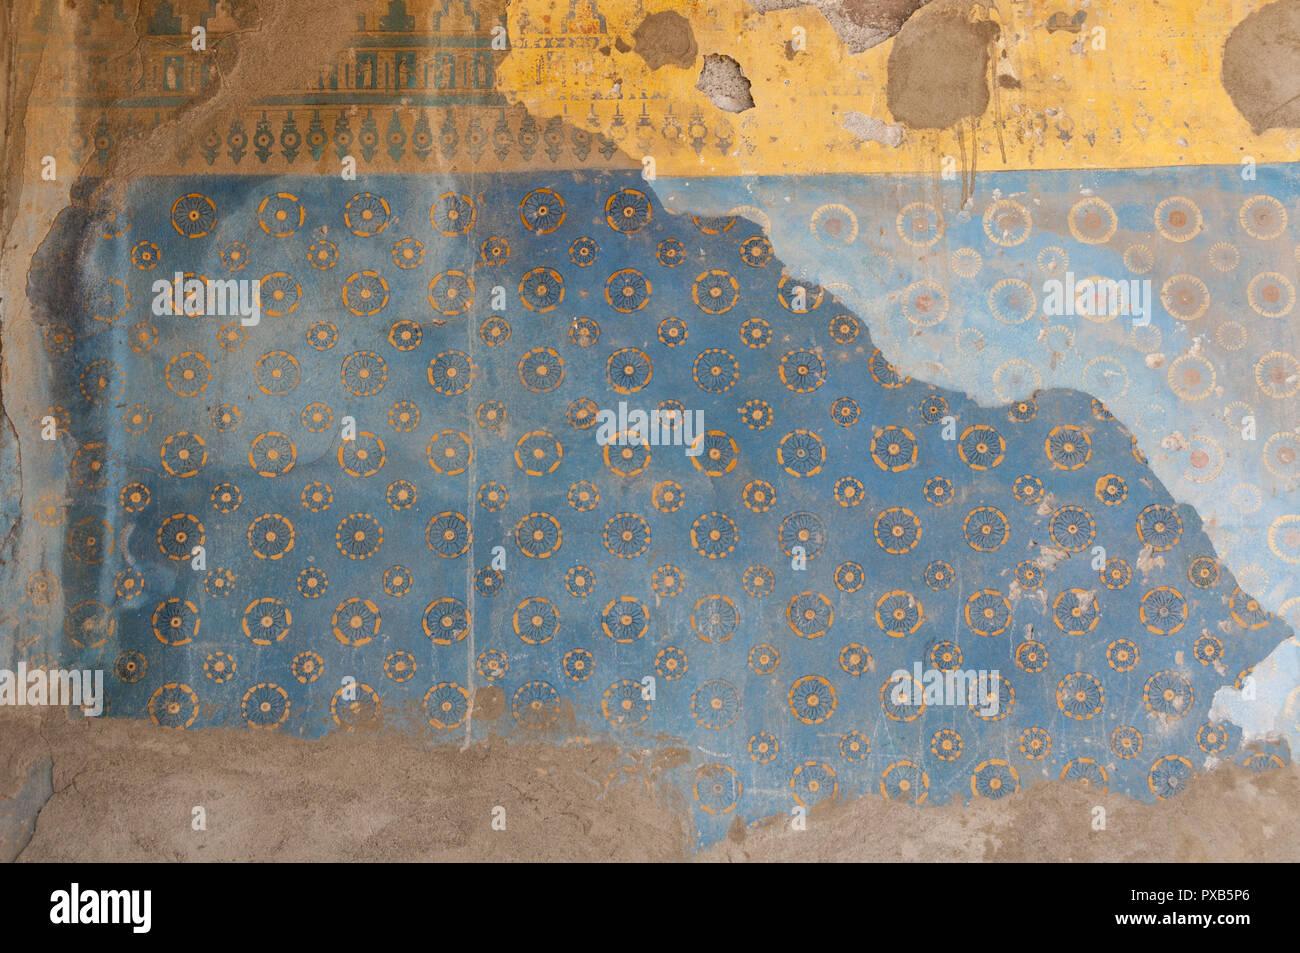 Armenia, Yerevan, Erebuni Fortress, Erebuni Museum of History, painting display Stock Photo